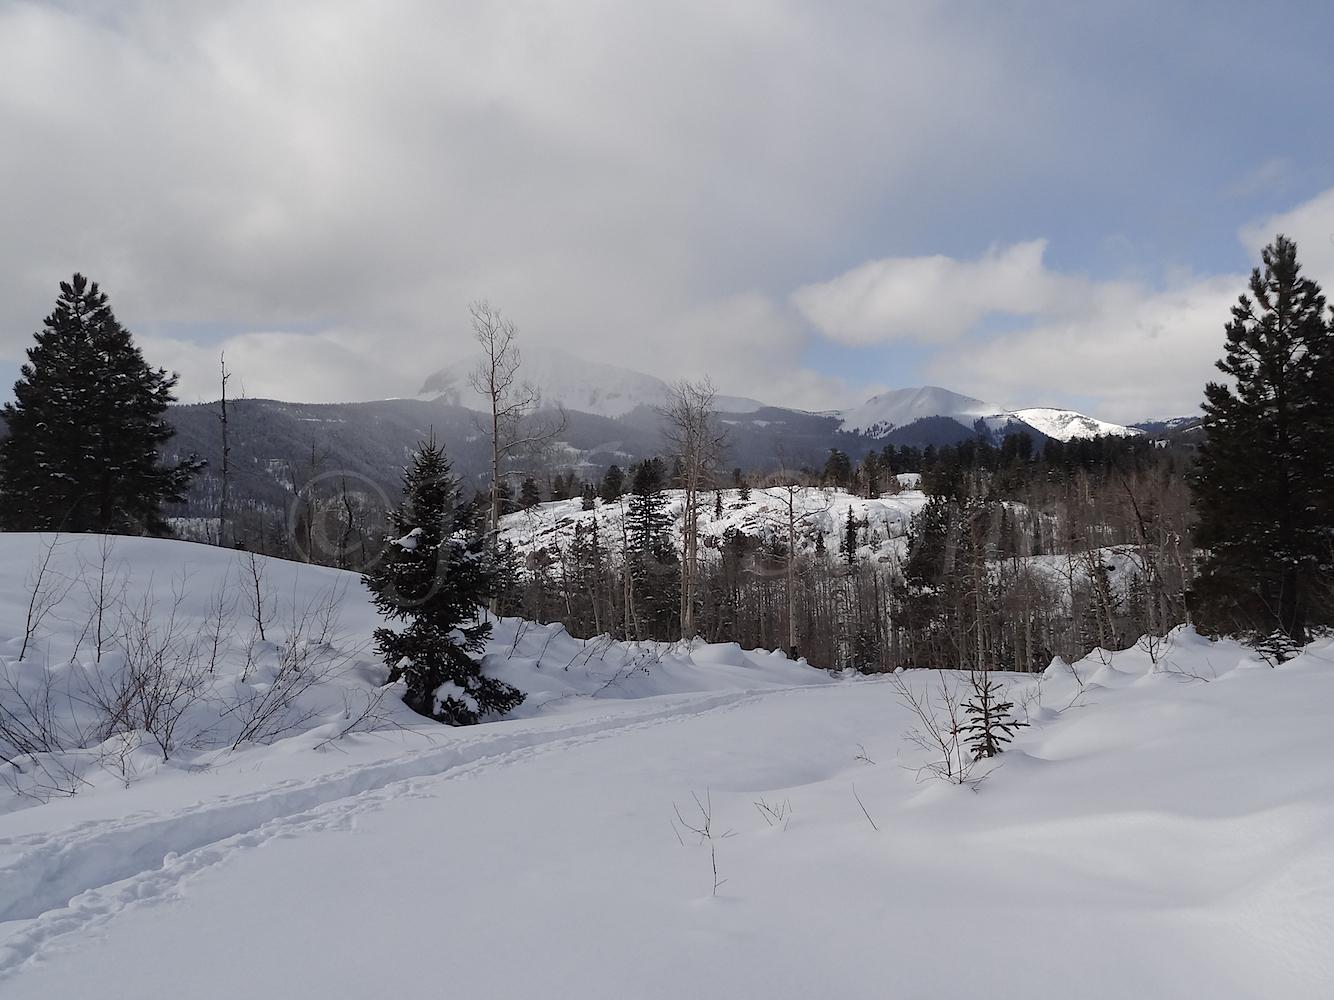 Lime Creek Road Snowshoe, Image #5299